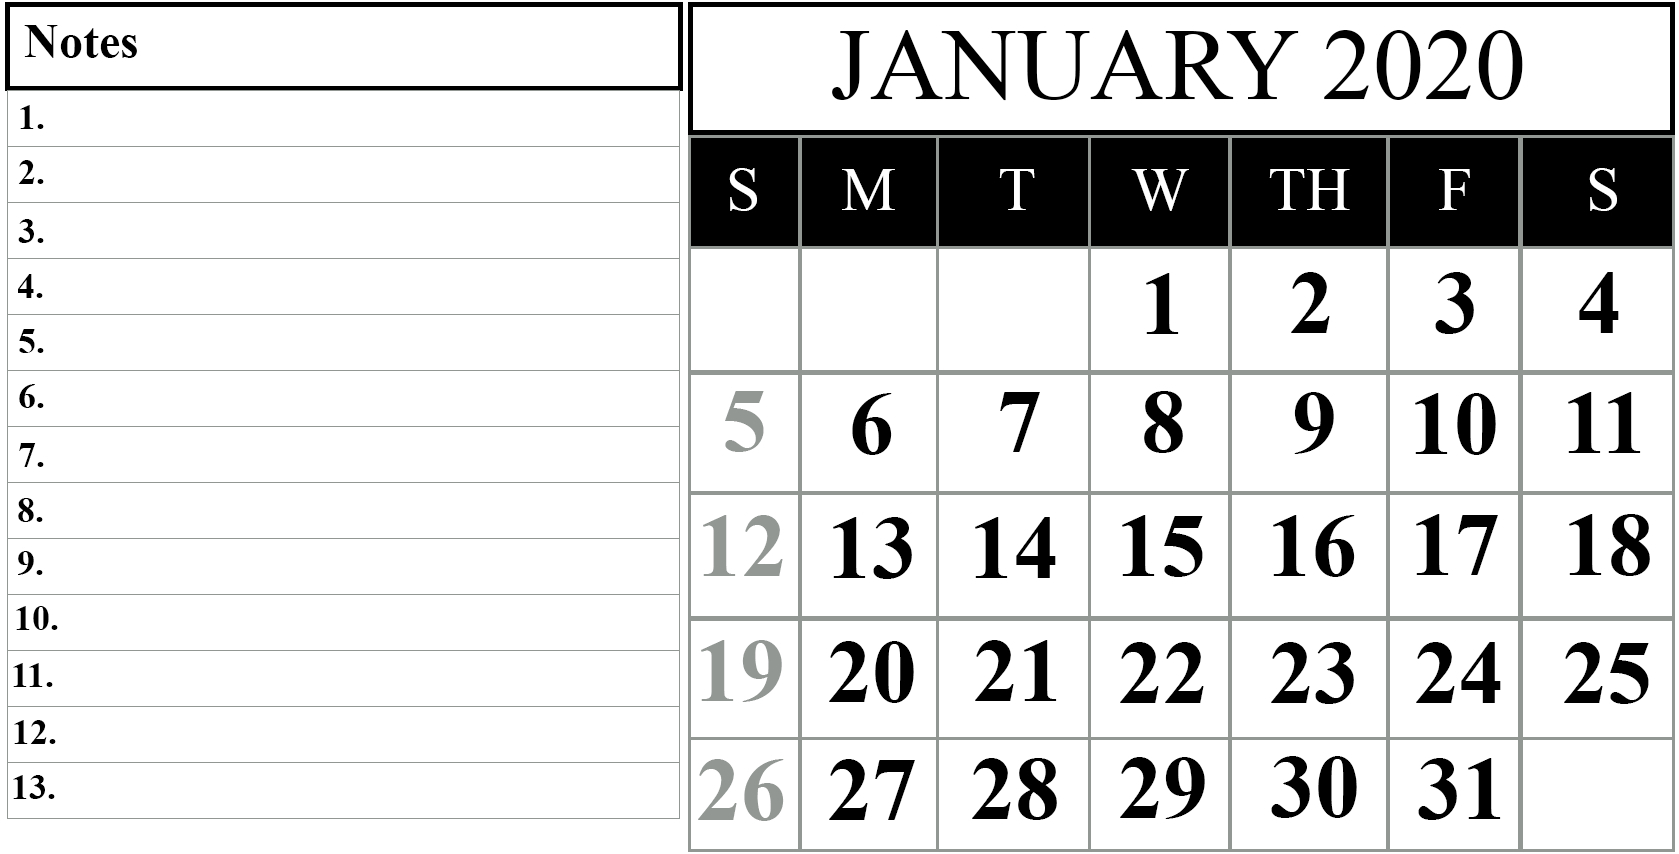 2020 Calendar I Can Edit | Calendar Template Printable Calanda Templete That I Can Edit